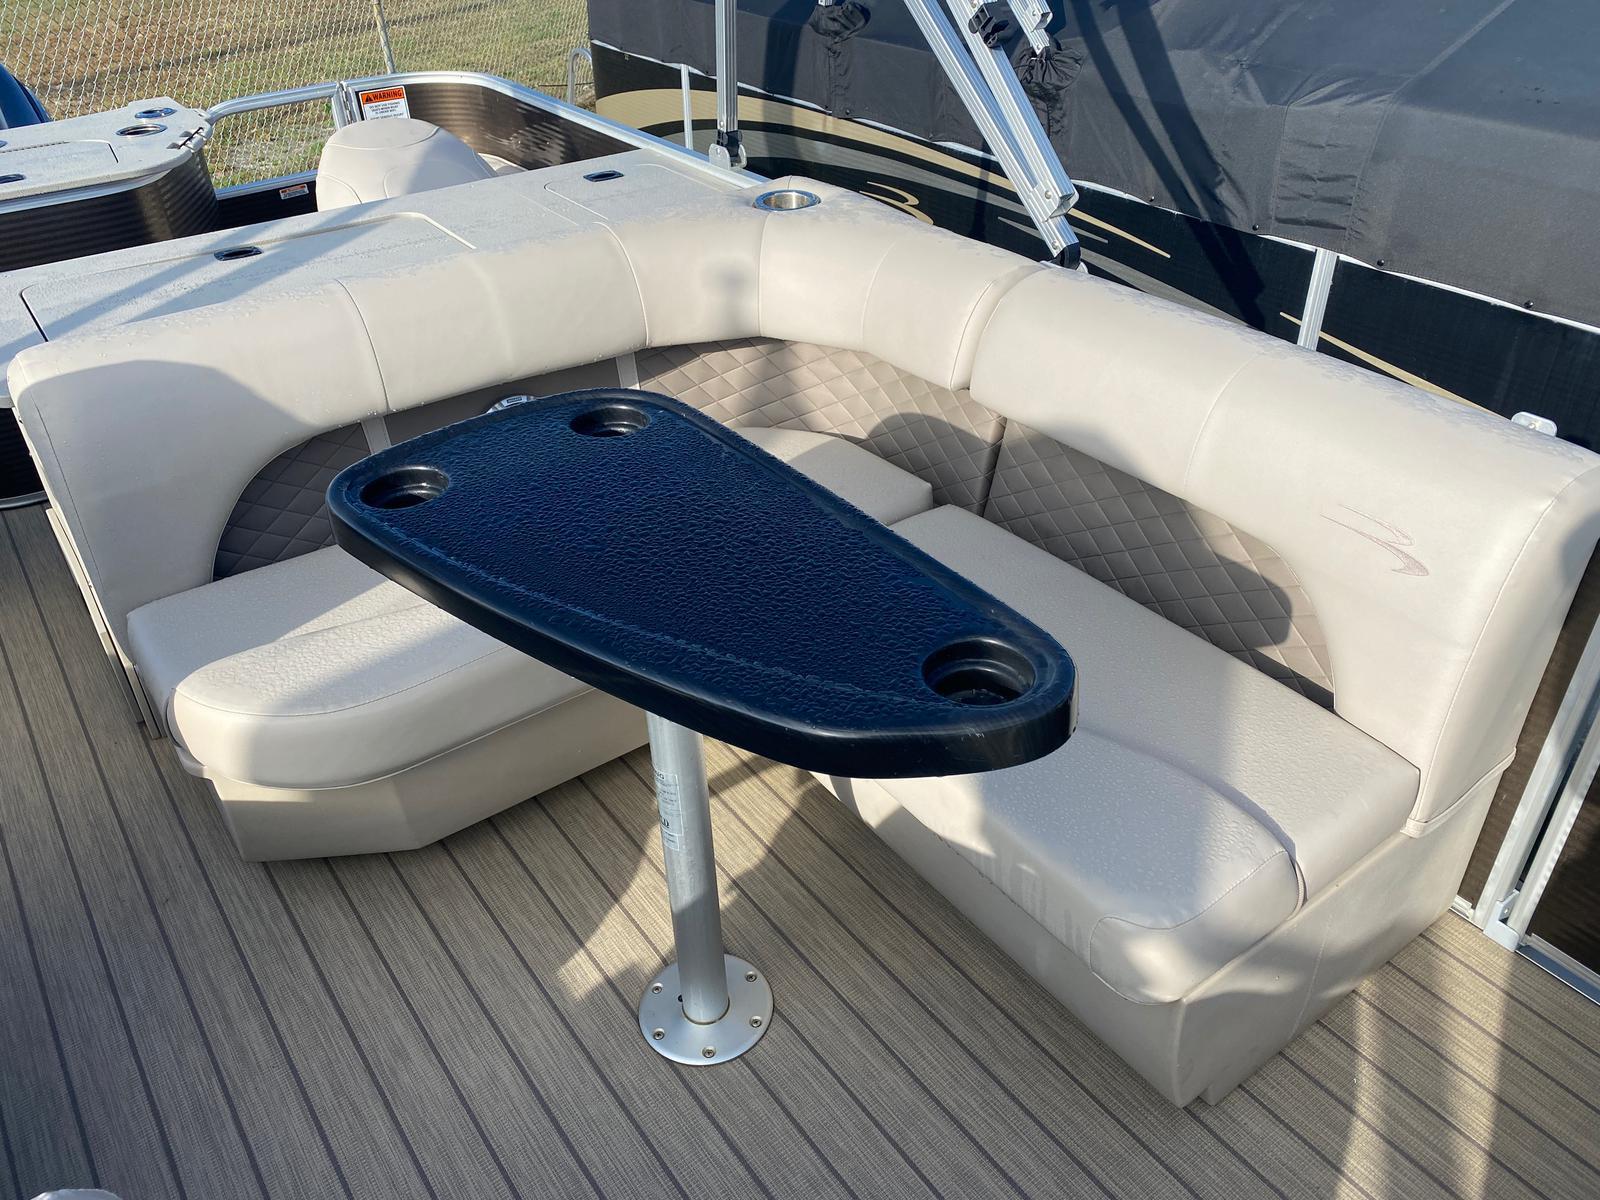 2018 Bennington boat for sale, model of the boat is 22 SSX Pontoon & Image # 7 of 13